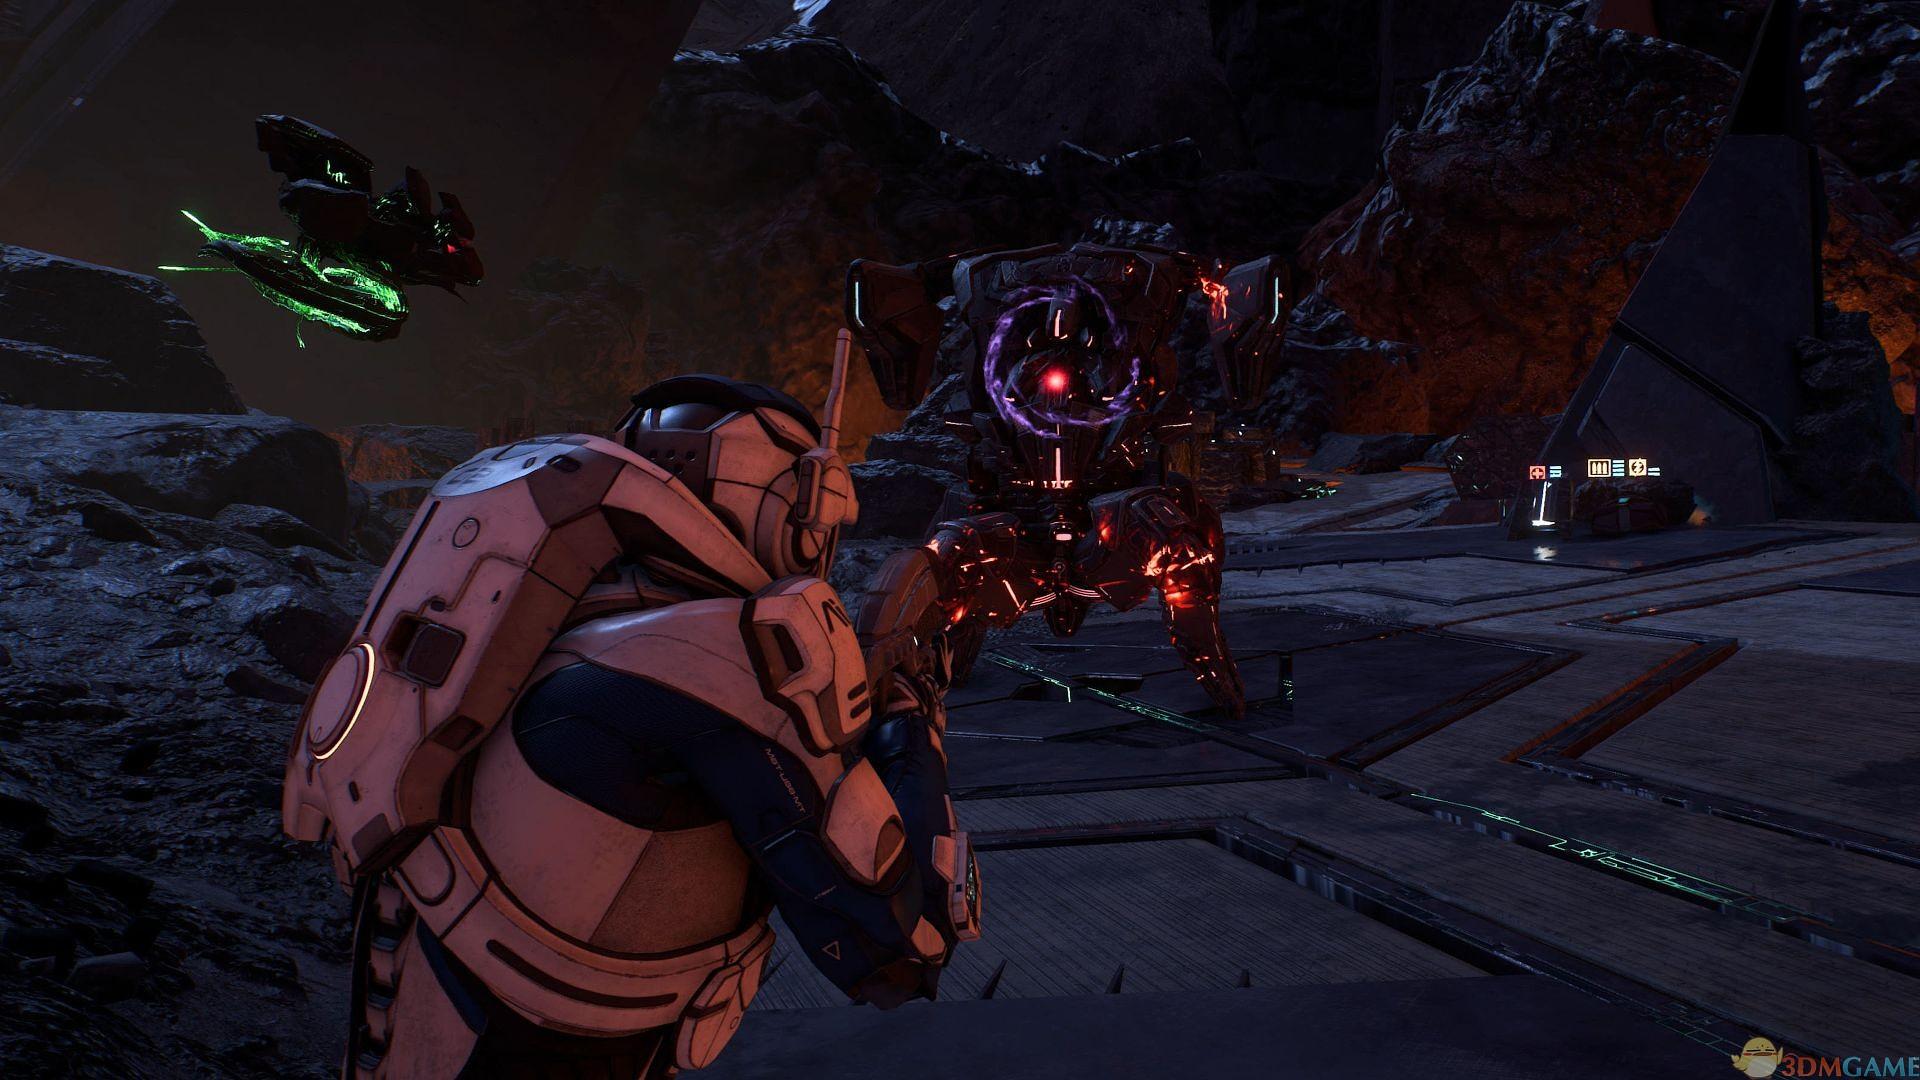 质量效应:仙女座 (Mass Effect:Andromeda)【v1.10豪华版 轩辕简中汉化 补】插图2